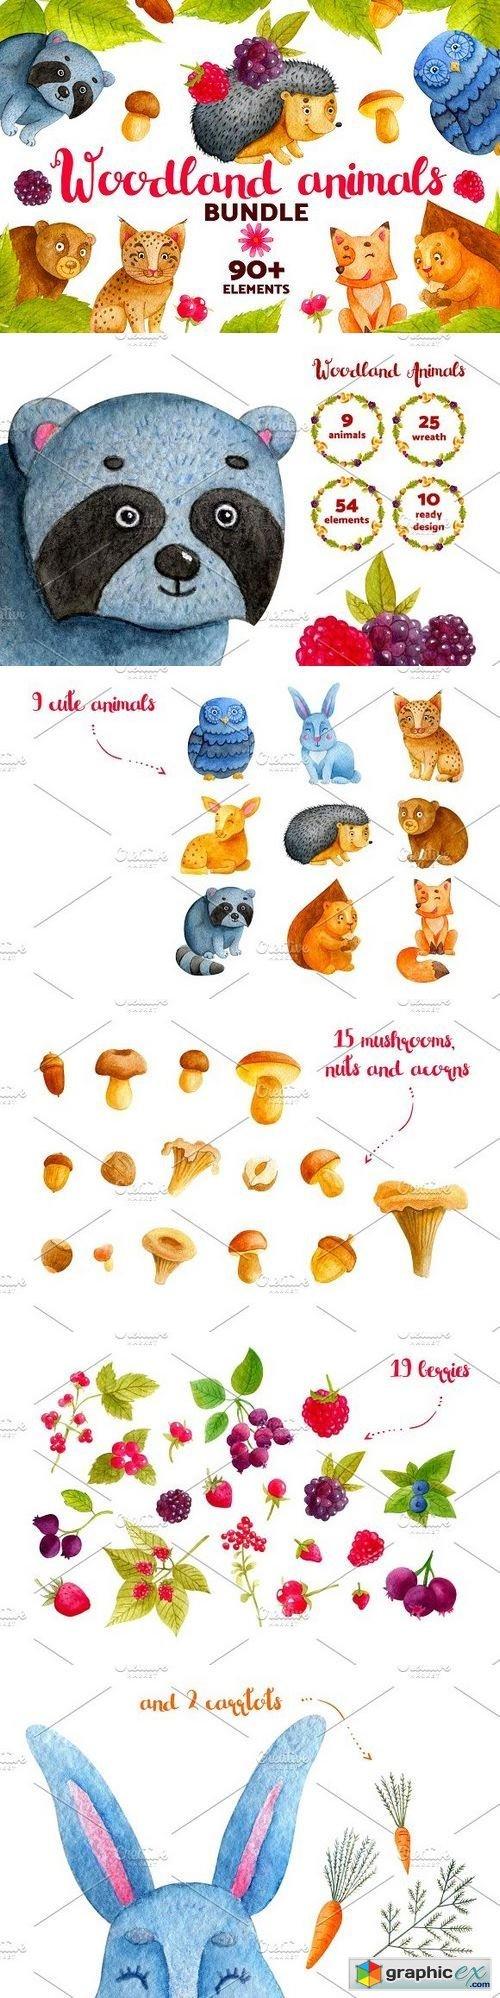 500x1998 Woodland Animals. Watercolor Bundle Free Download Vector Stock